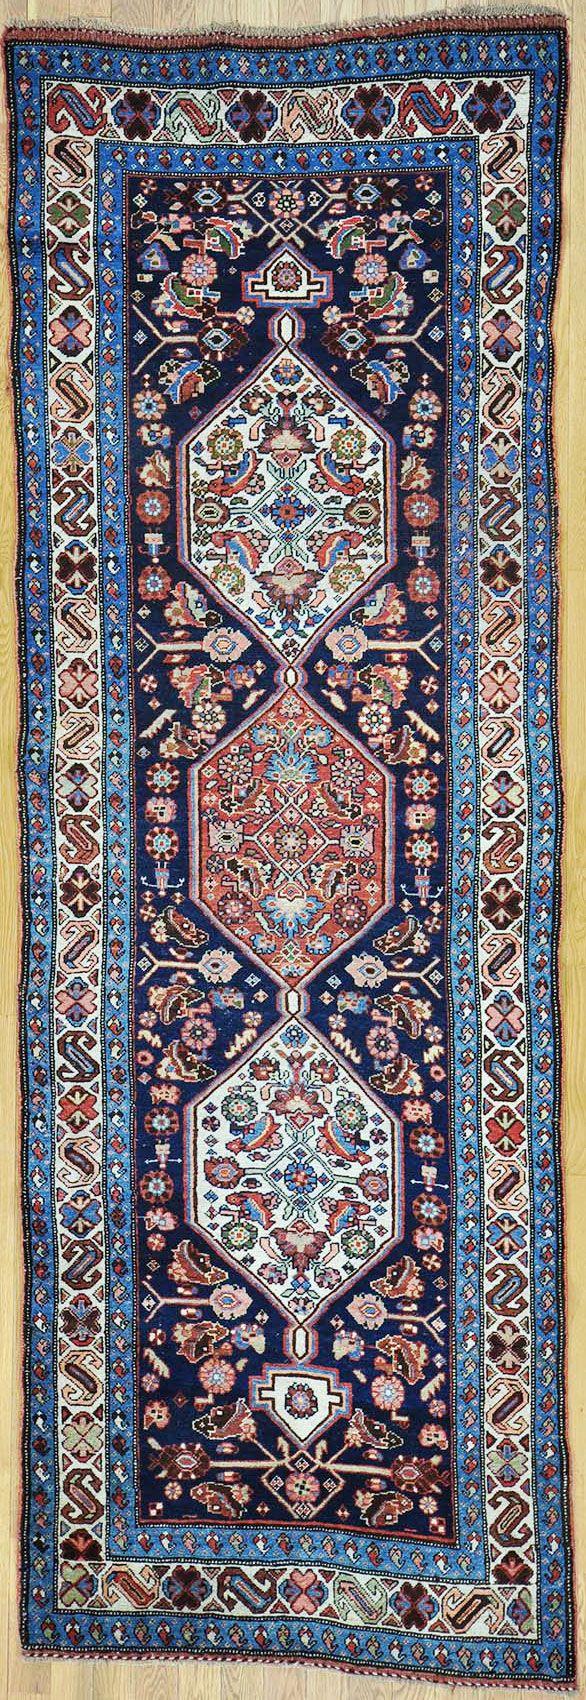 "Buy Hand Knotted Bijar Persian Rug 3' 7"" x 10' 9"" at OLDCARPET"